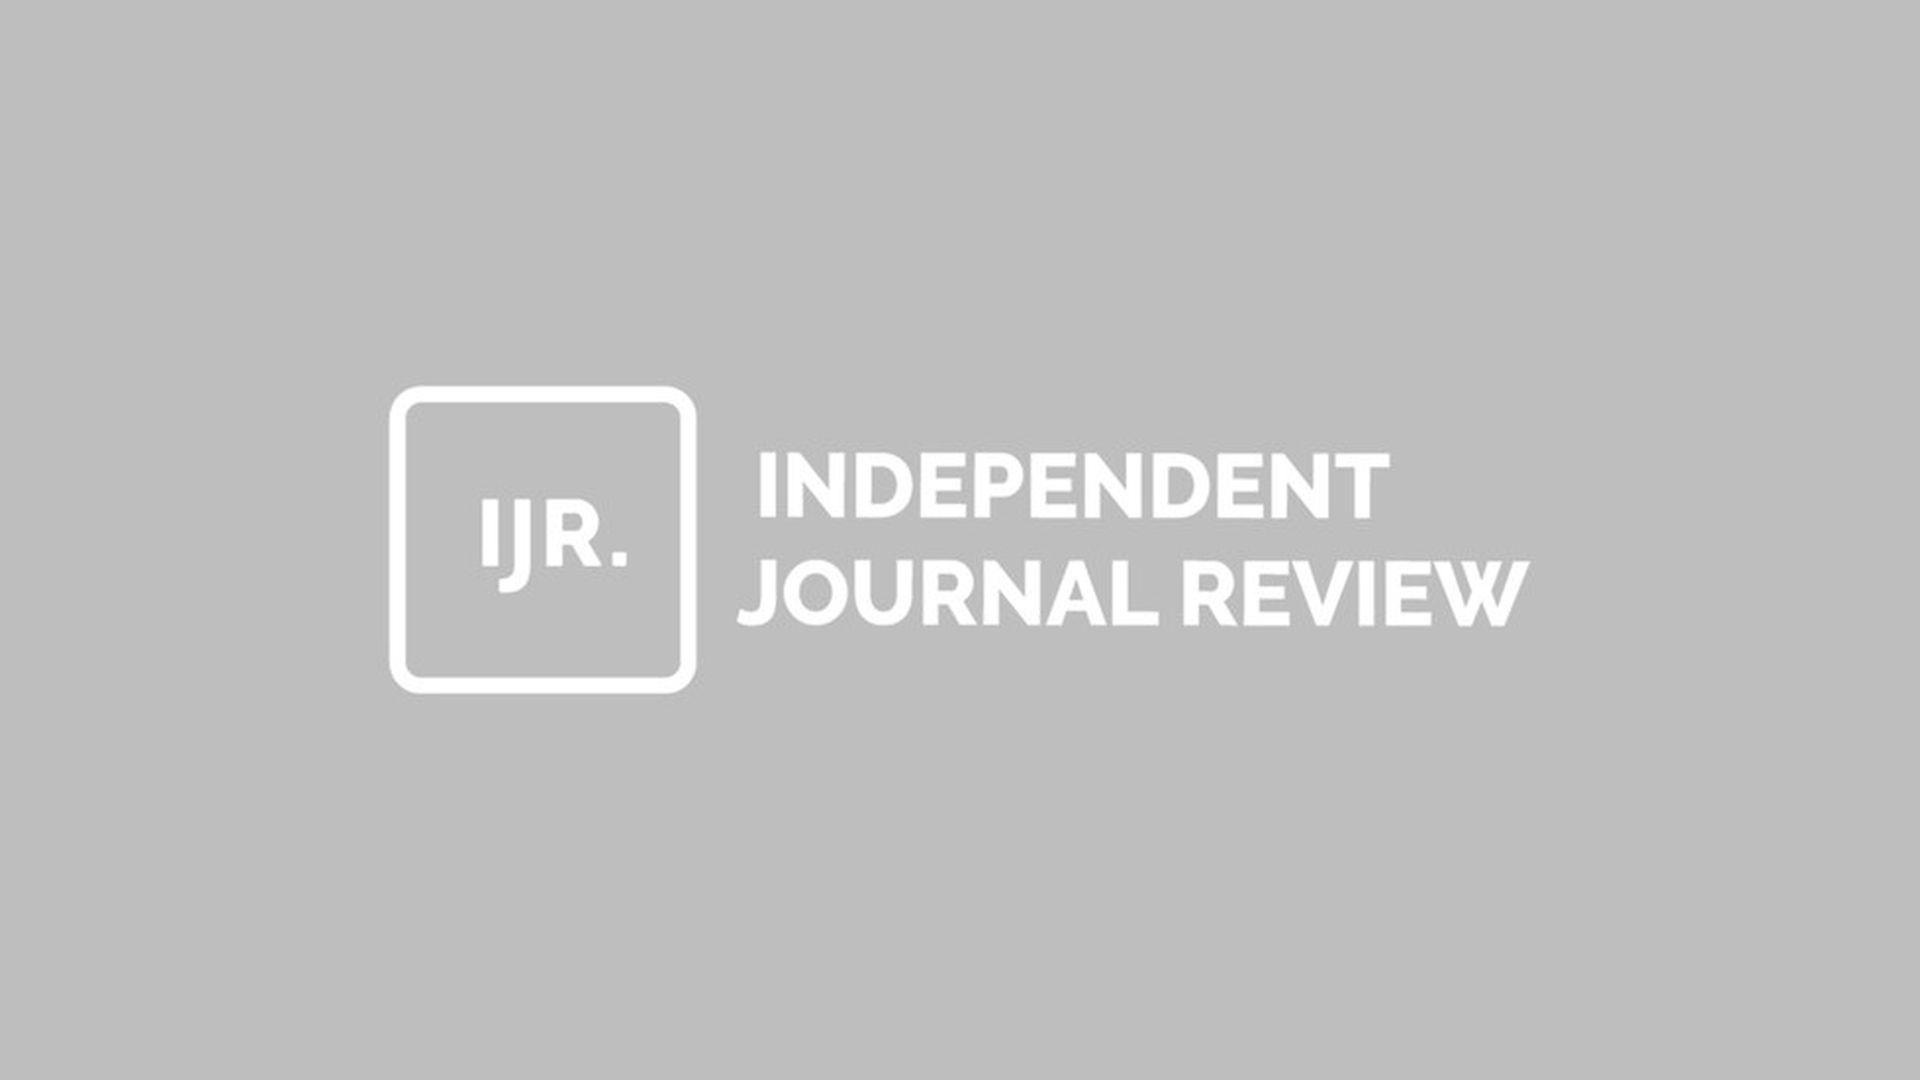 International Journal Review Faces Massive Layoffs